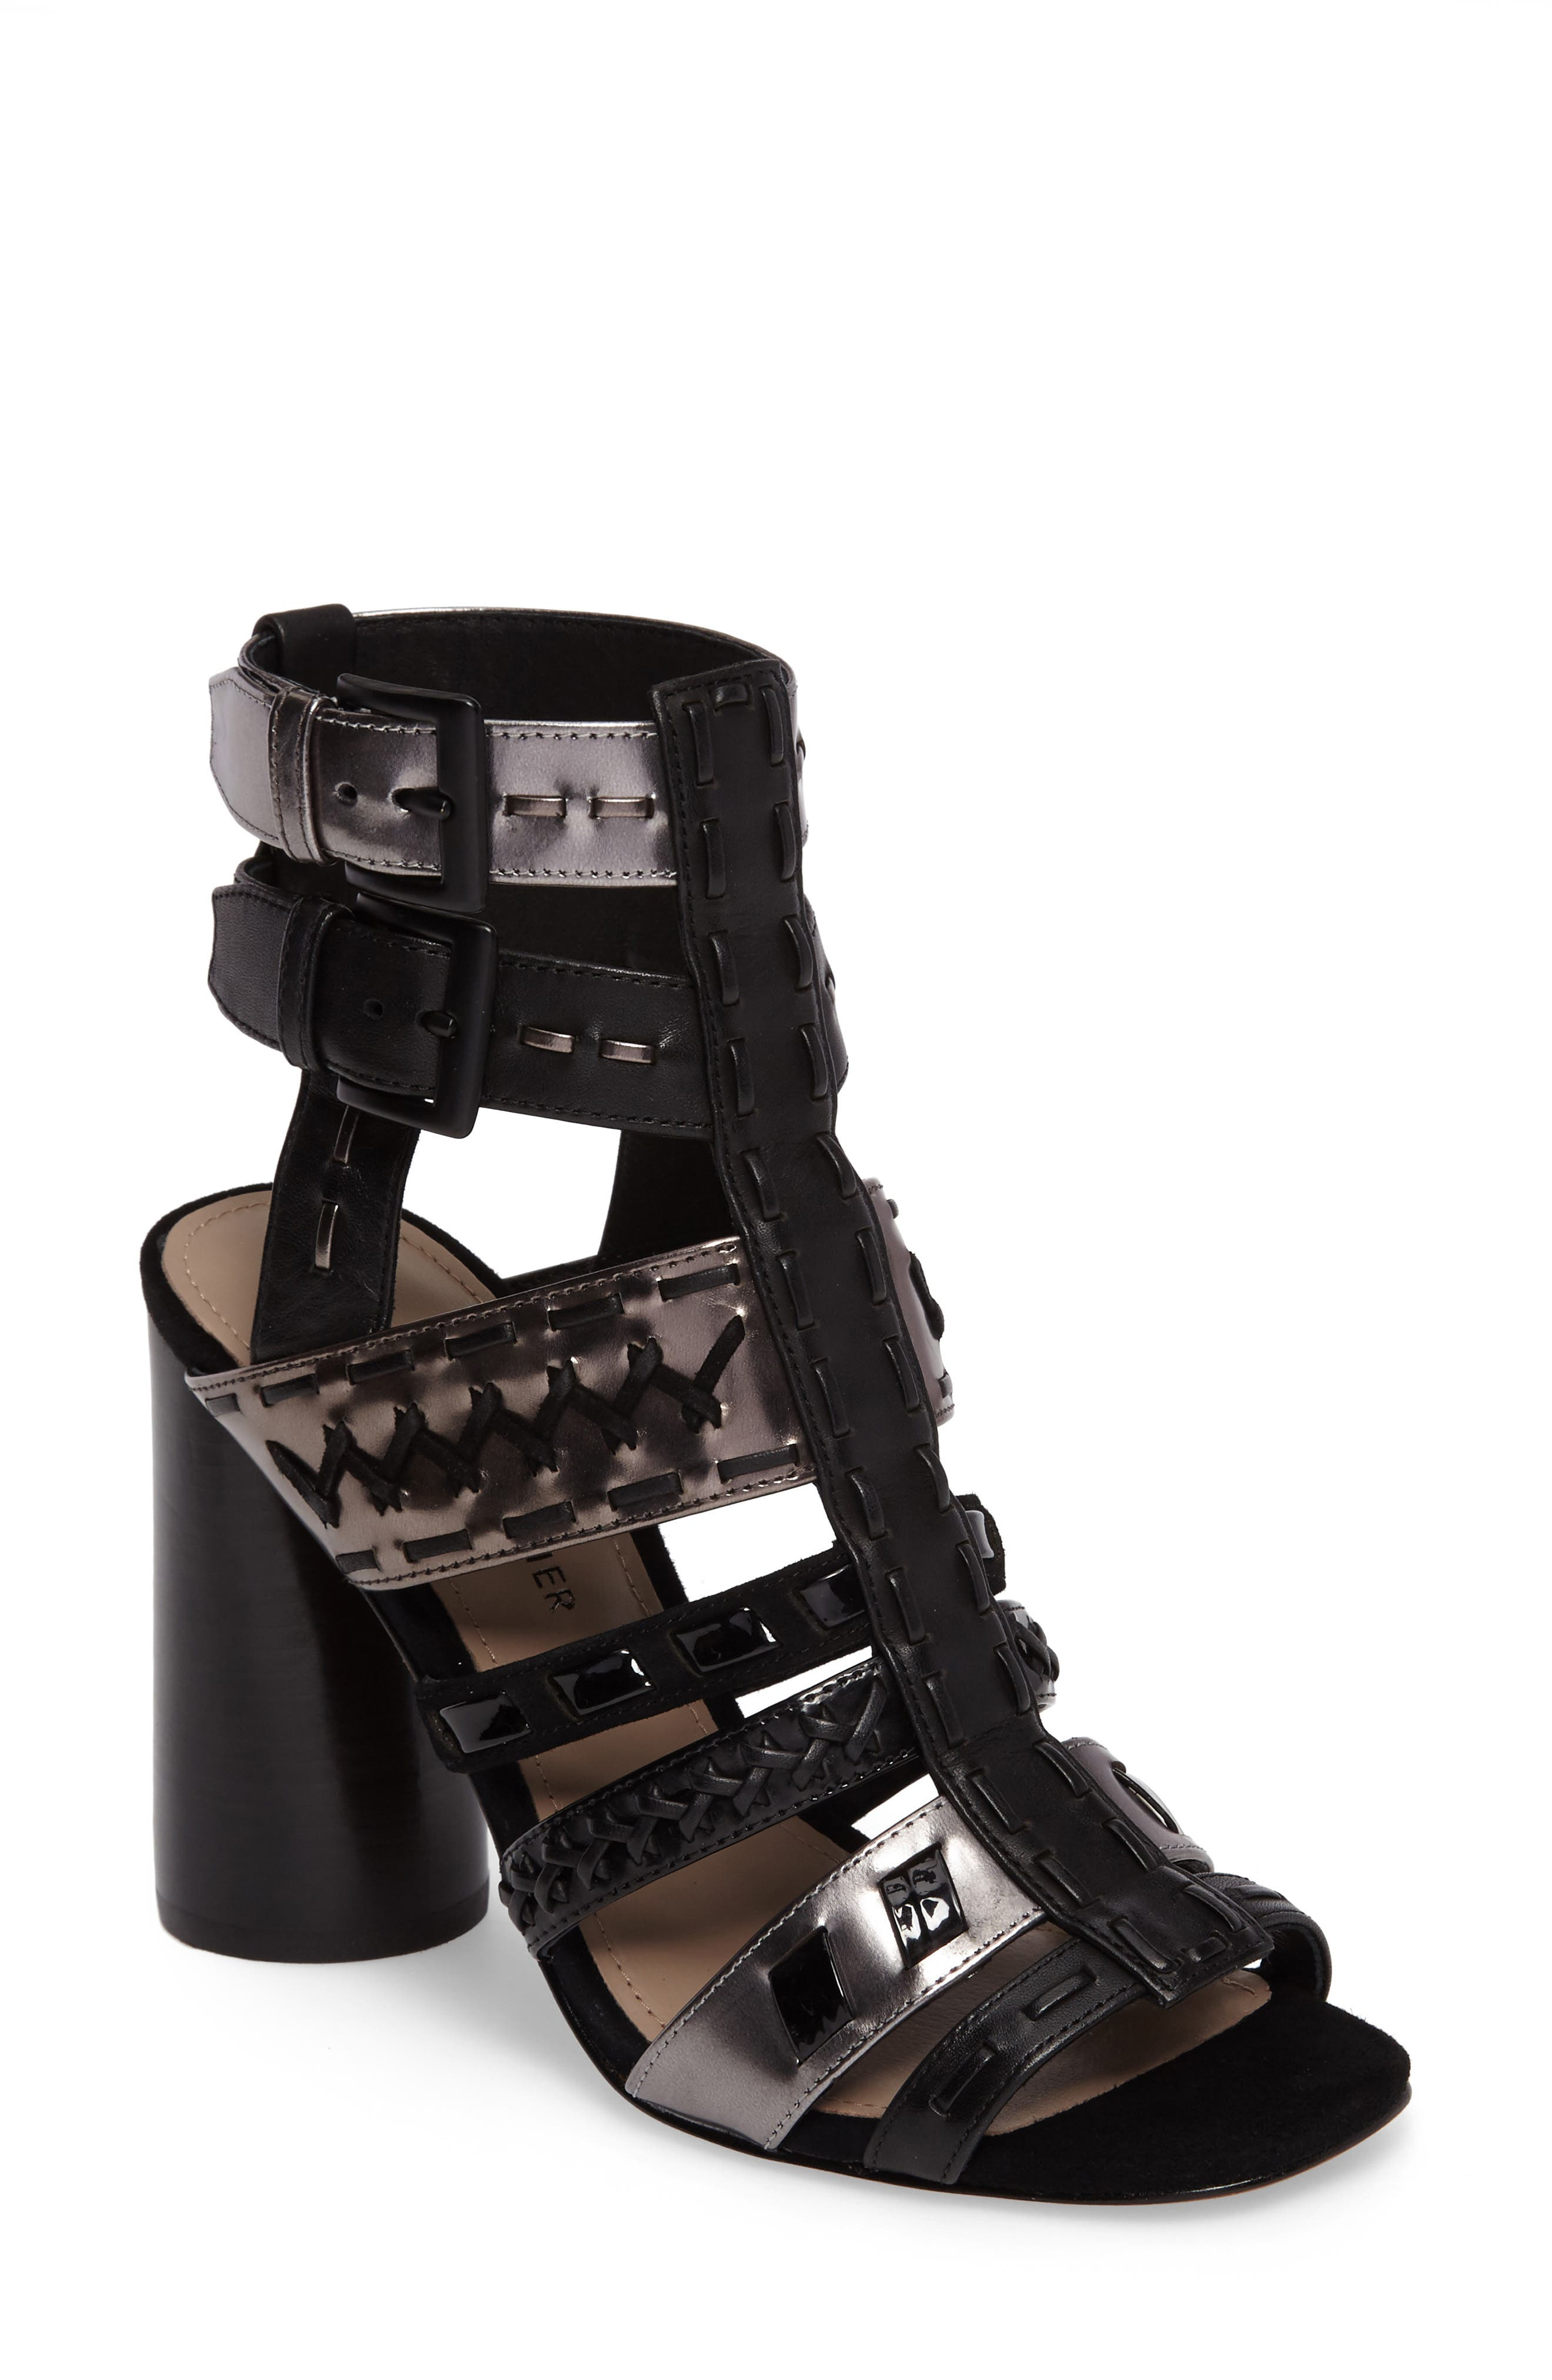 Alternate Image 1 Selected - Donald J Pliner Bindy Column Heel Cage Sandal (Women)